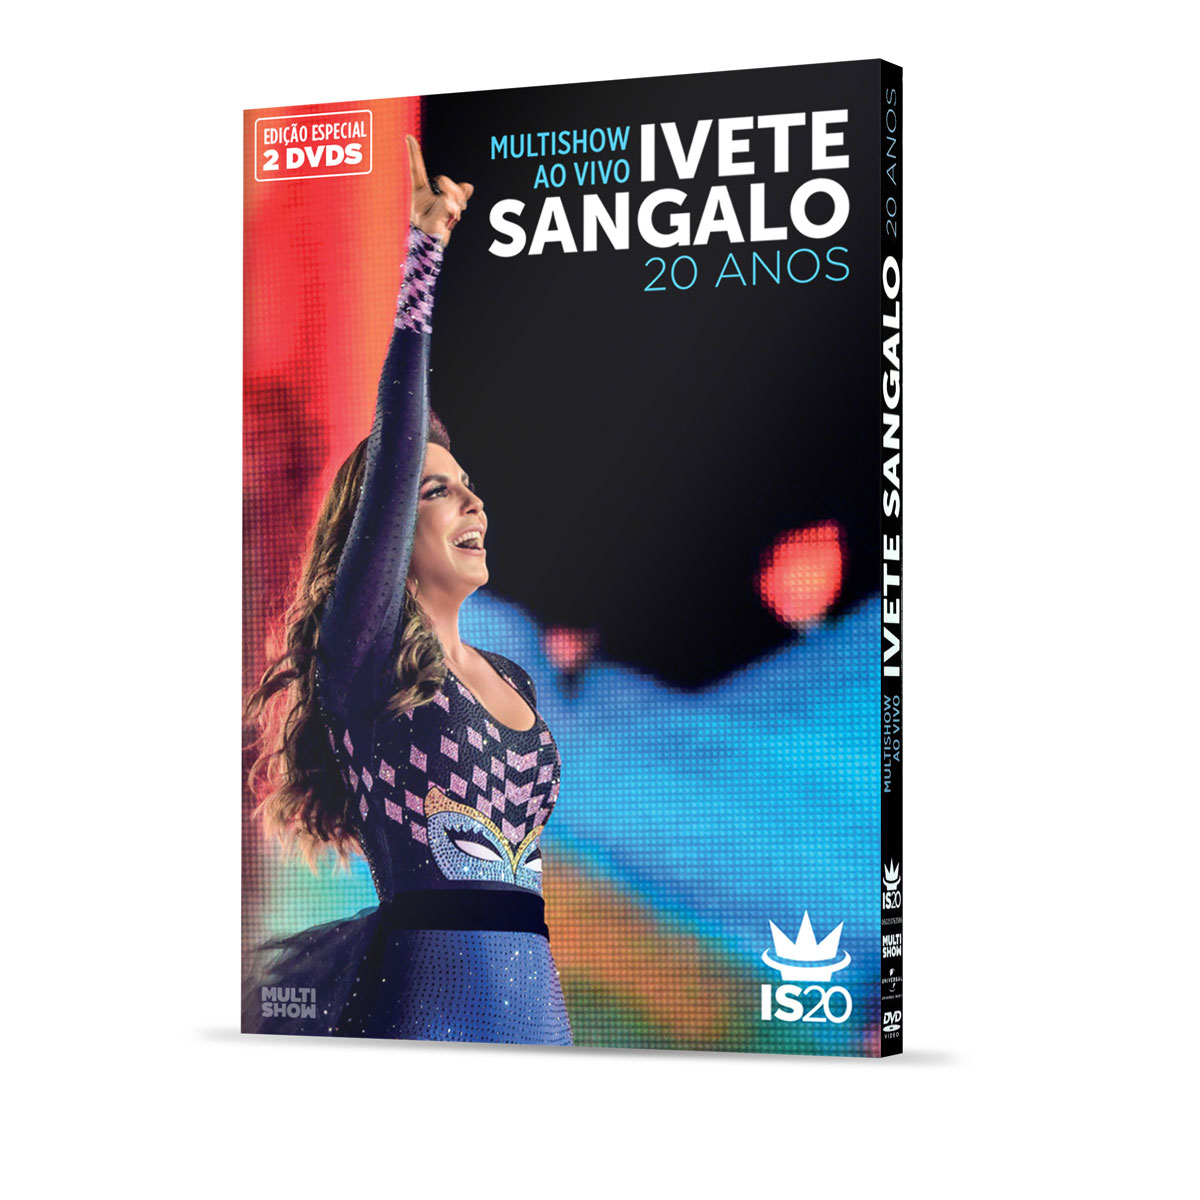 DVD Duplo Ivete Sangalo 20 Anos Ao Vivo no Multishow